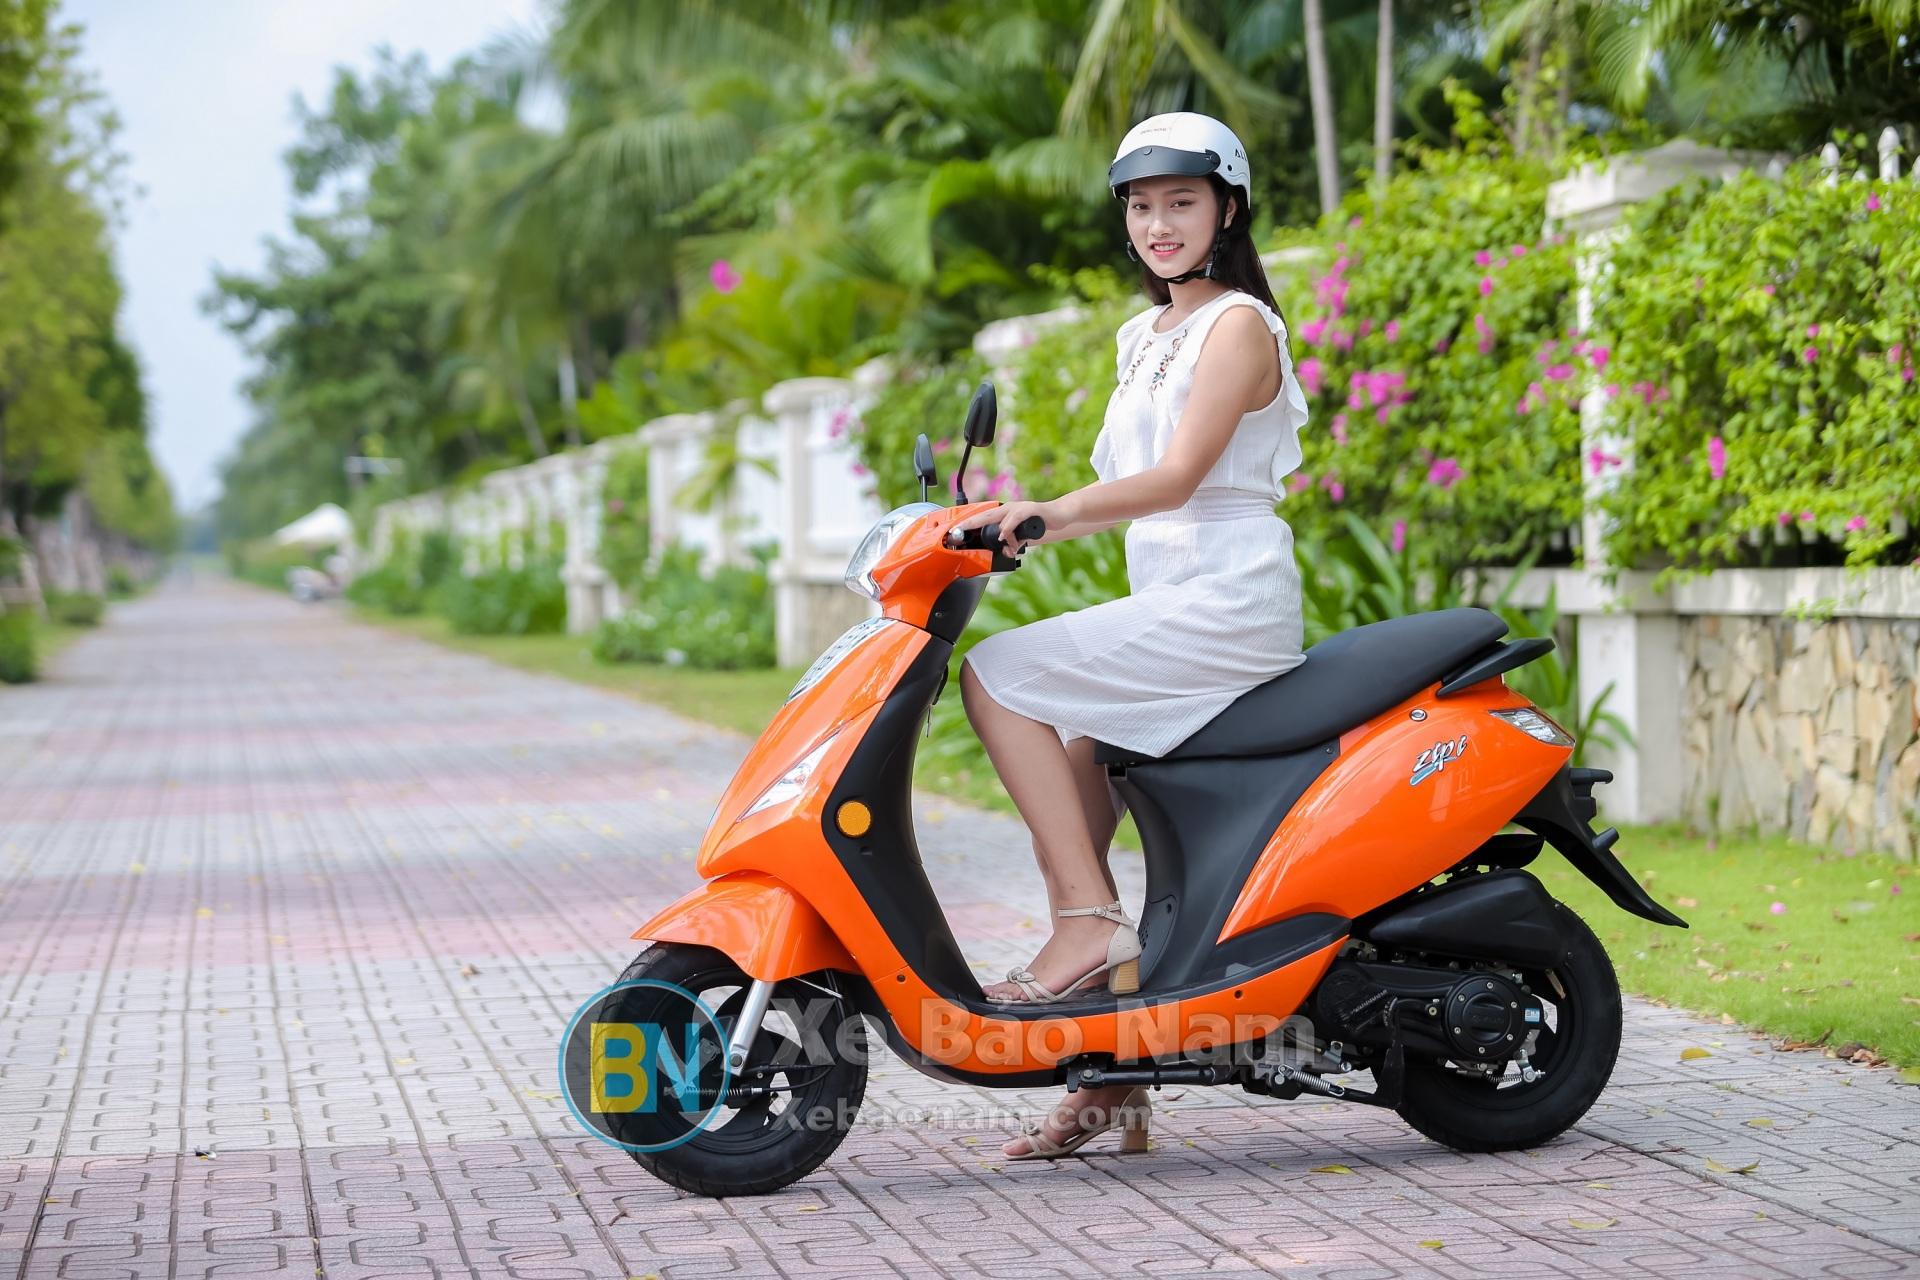 xe-ga-50cc-zip-khong-can-bang-lai